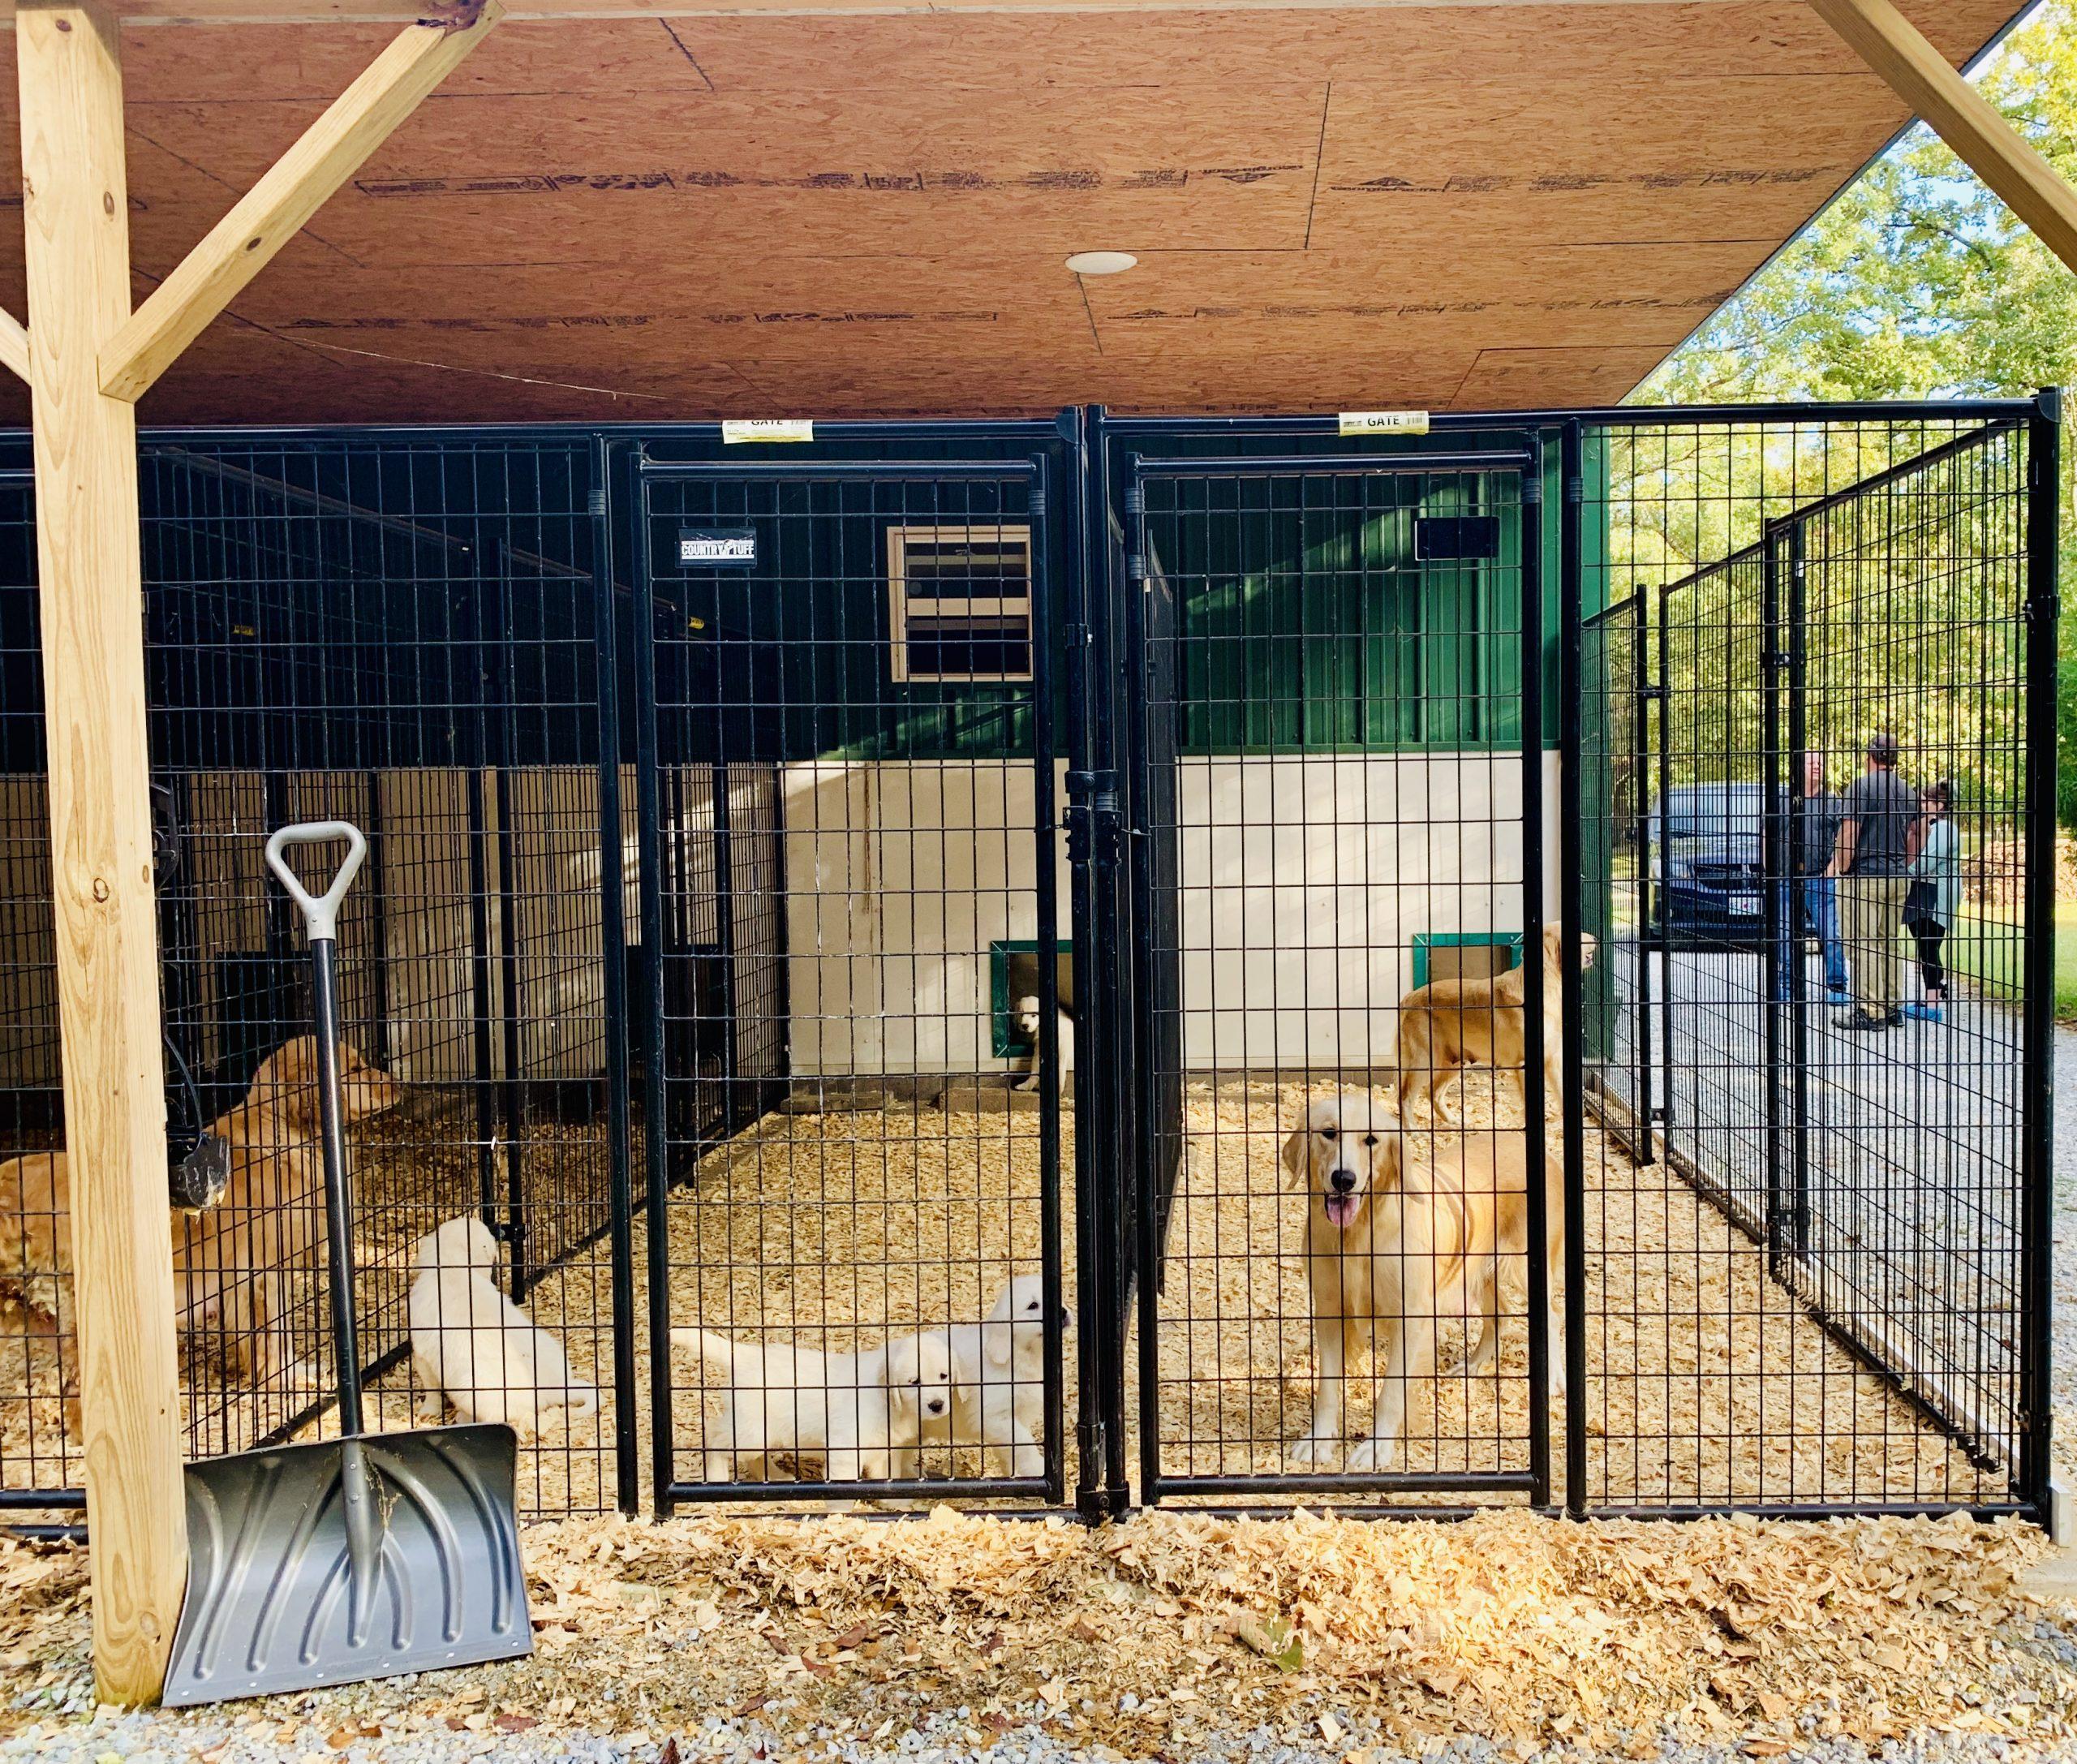 Dogs in kennels